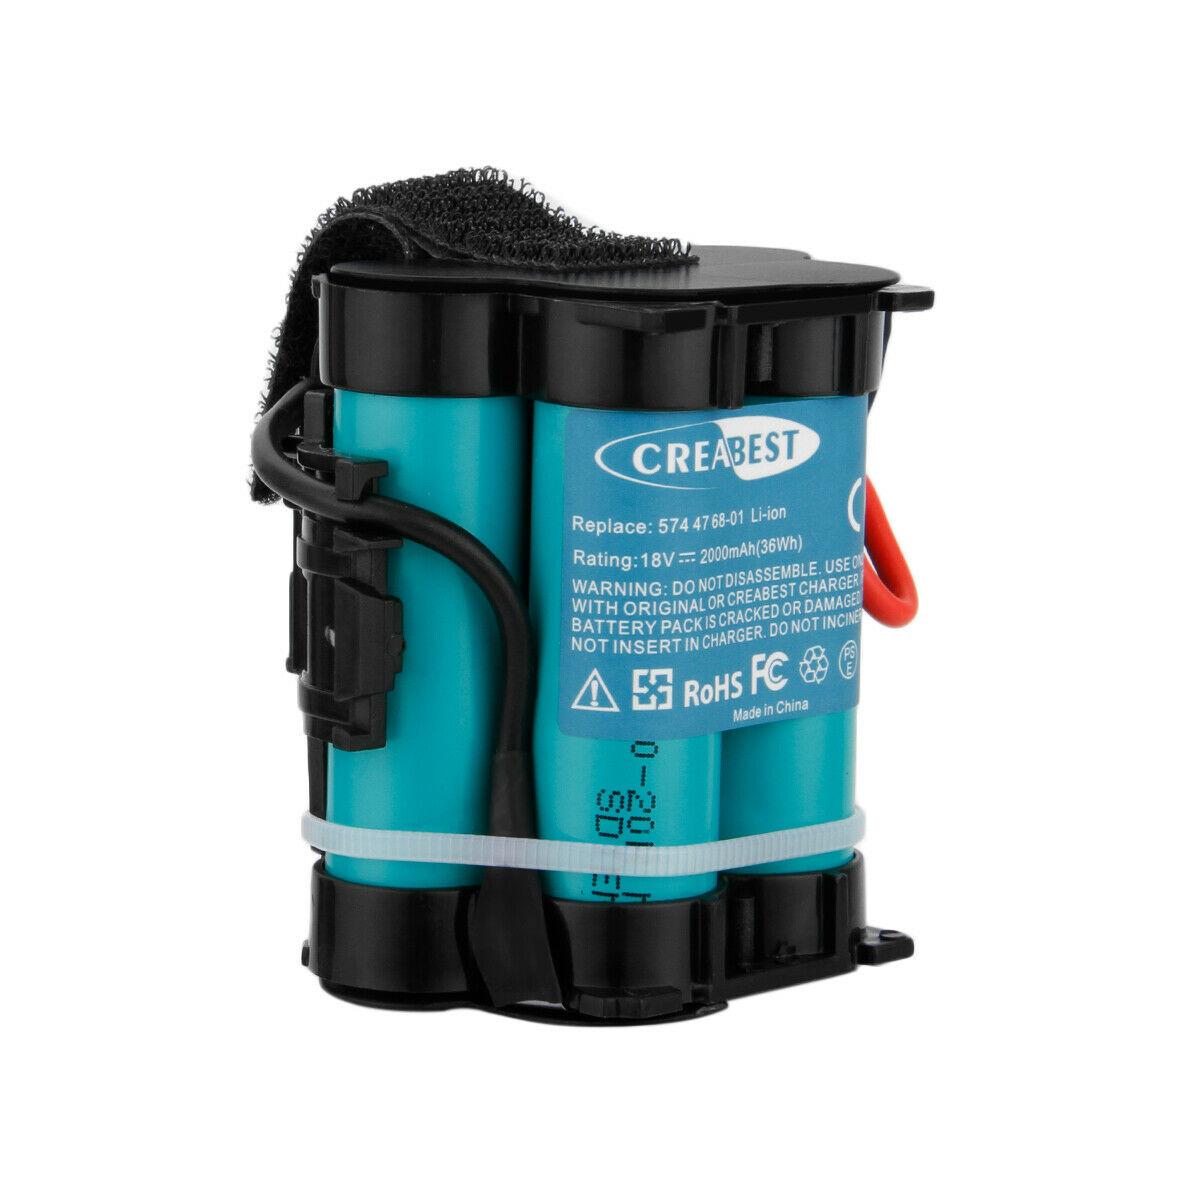 Gardena Mahroboter R40Li R45Li R70Li 574 47 68-01 2000mAh 18V Li-Ion zgodny Bateria